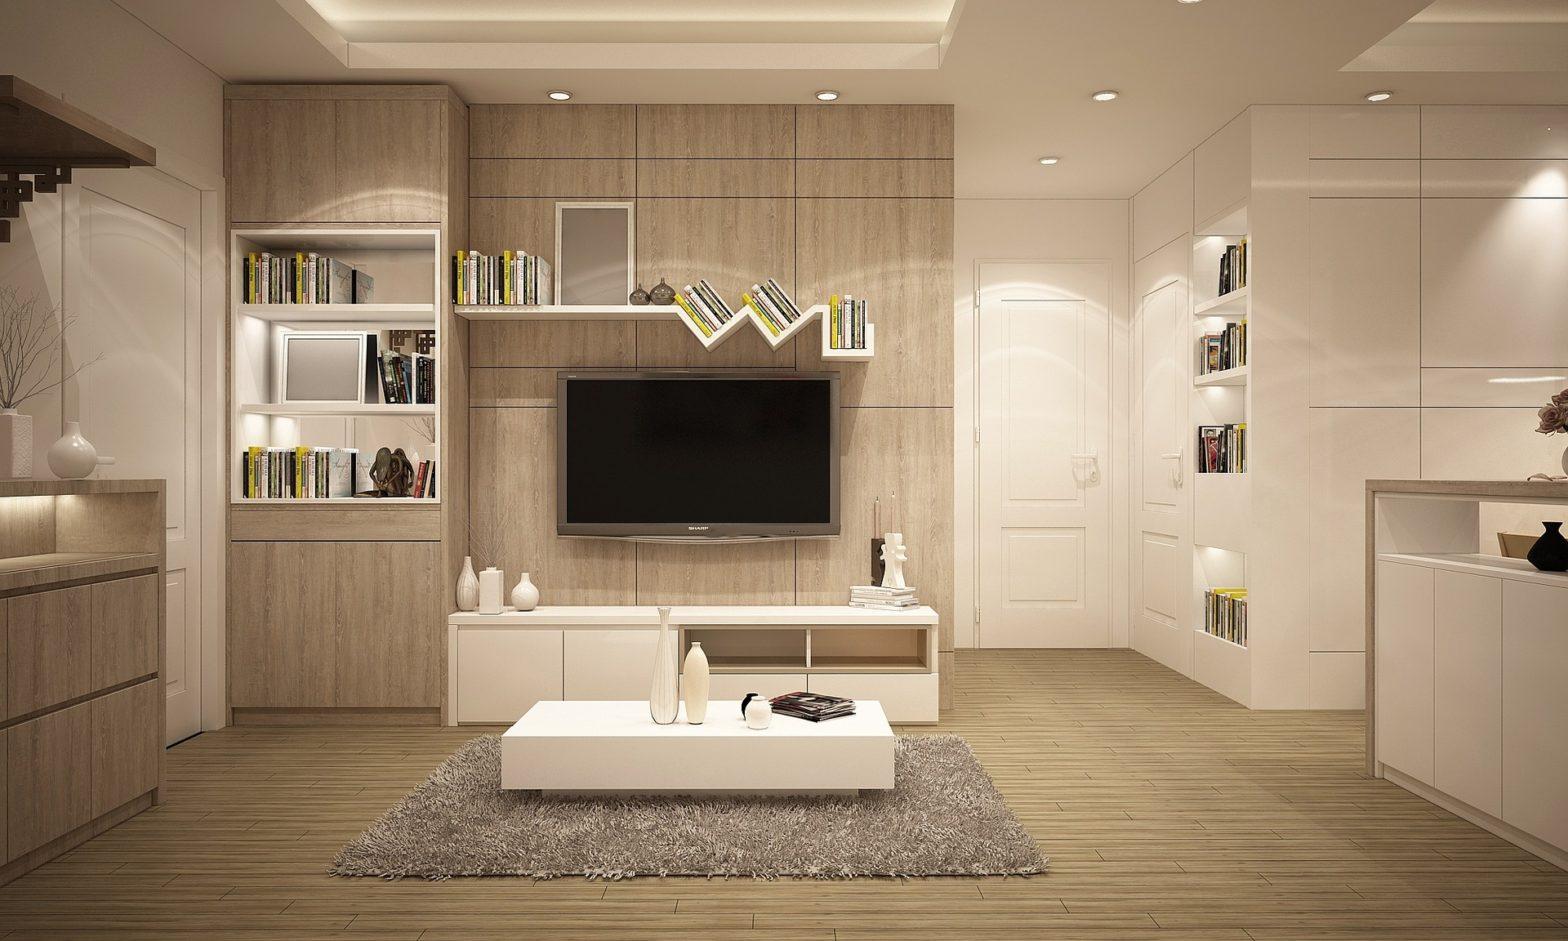 Ceiling Design For Hall, Living Room, Bed Room, Kitchen ...